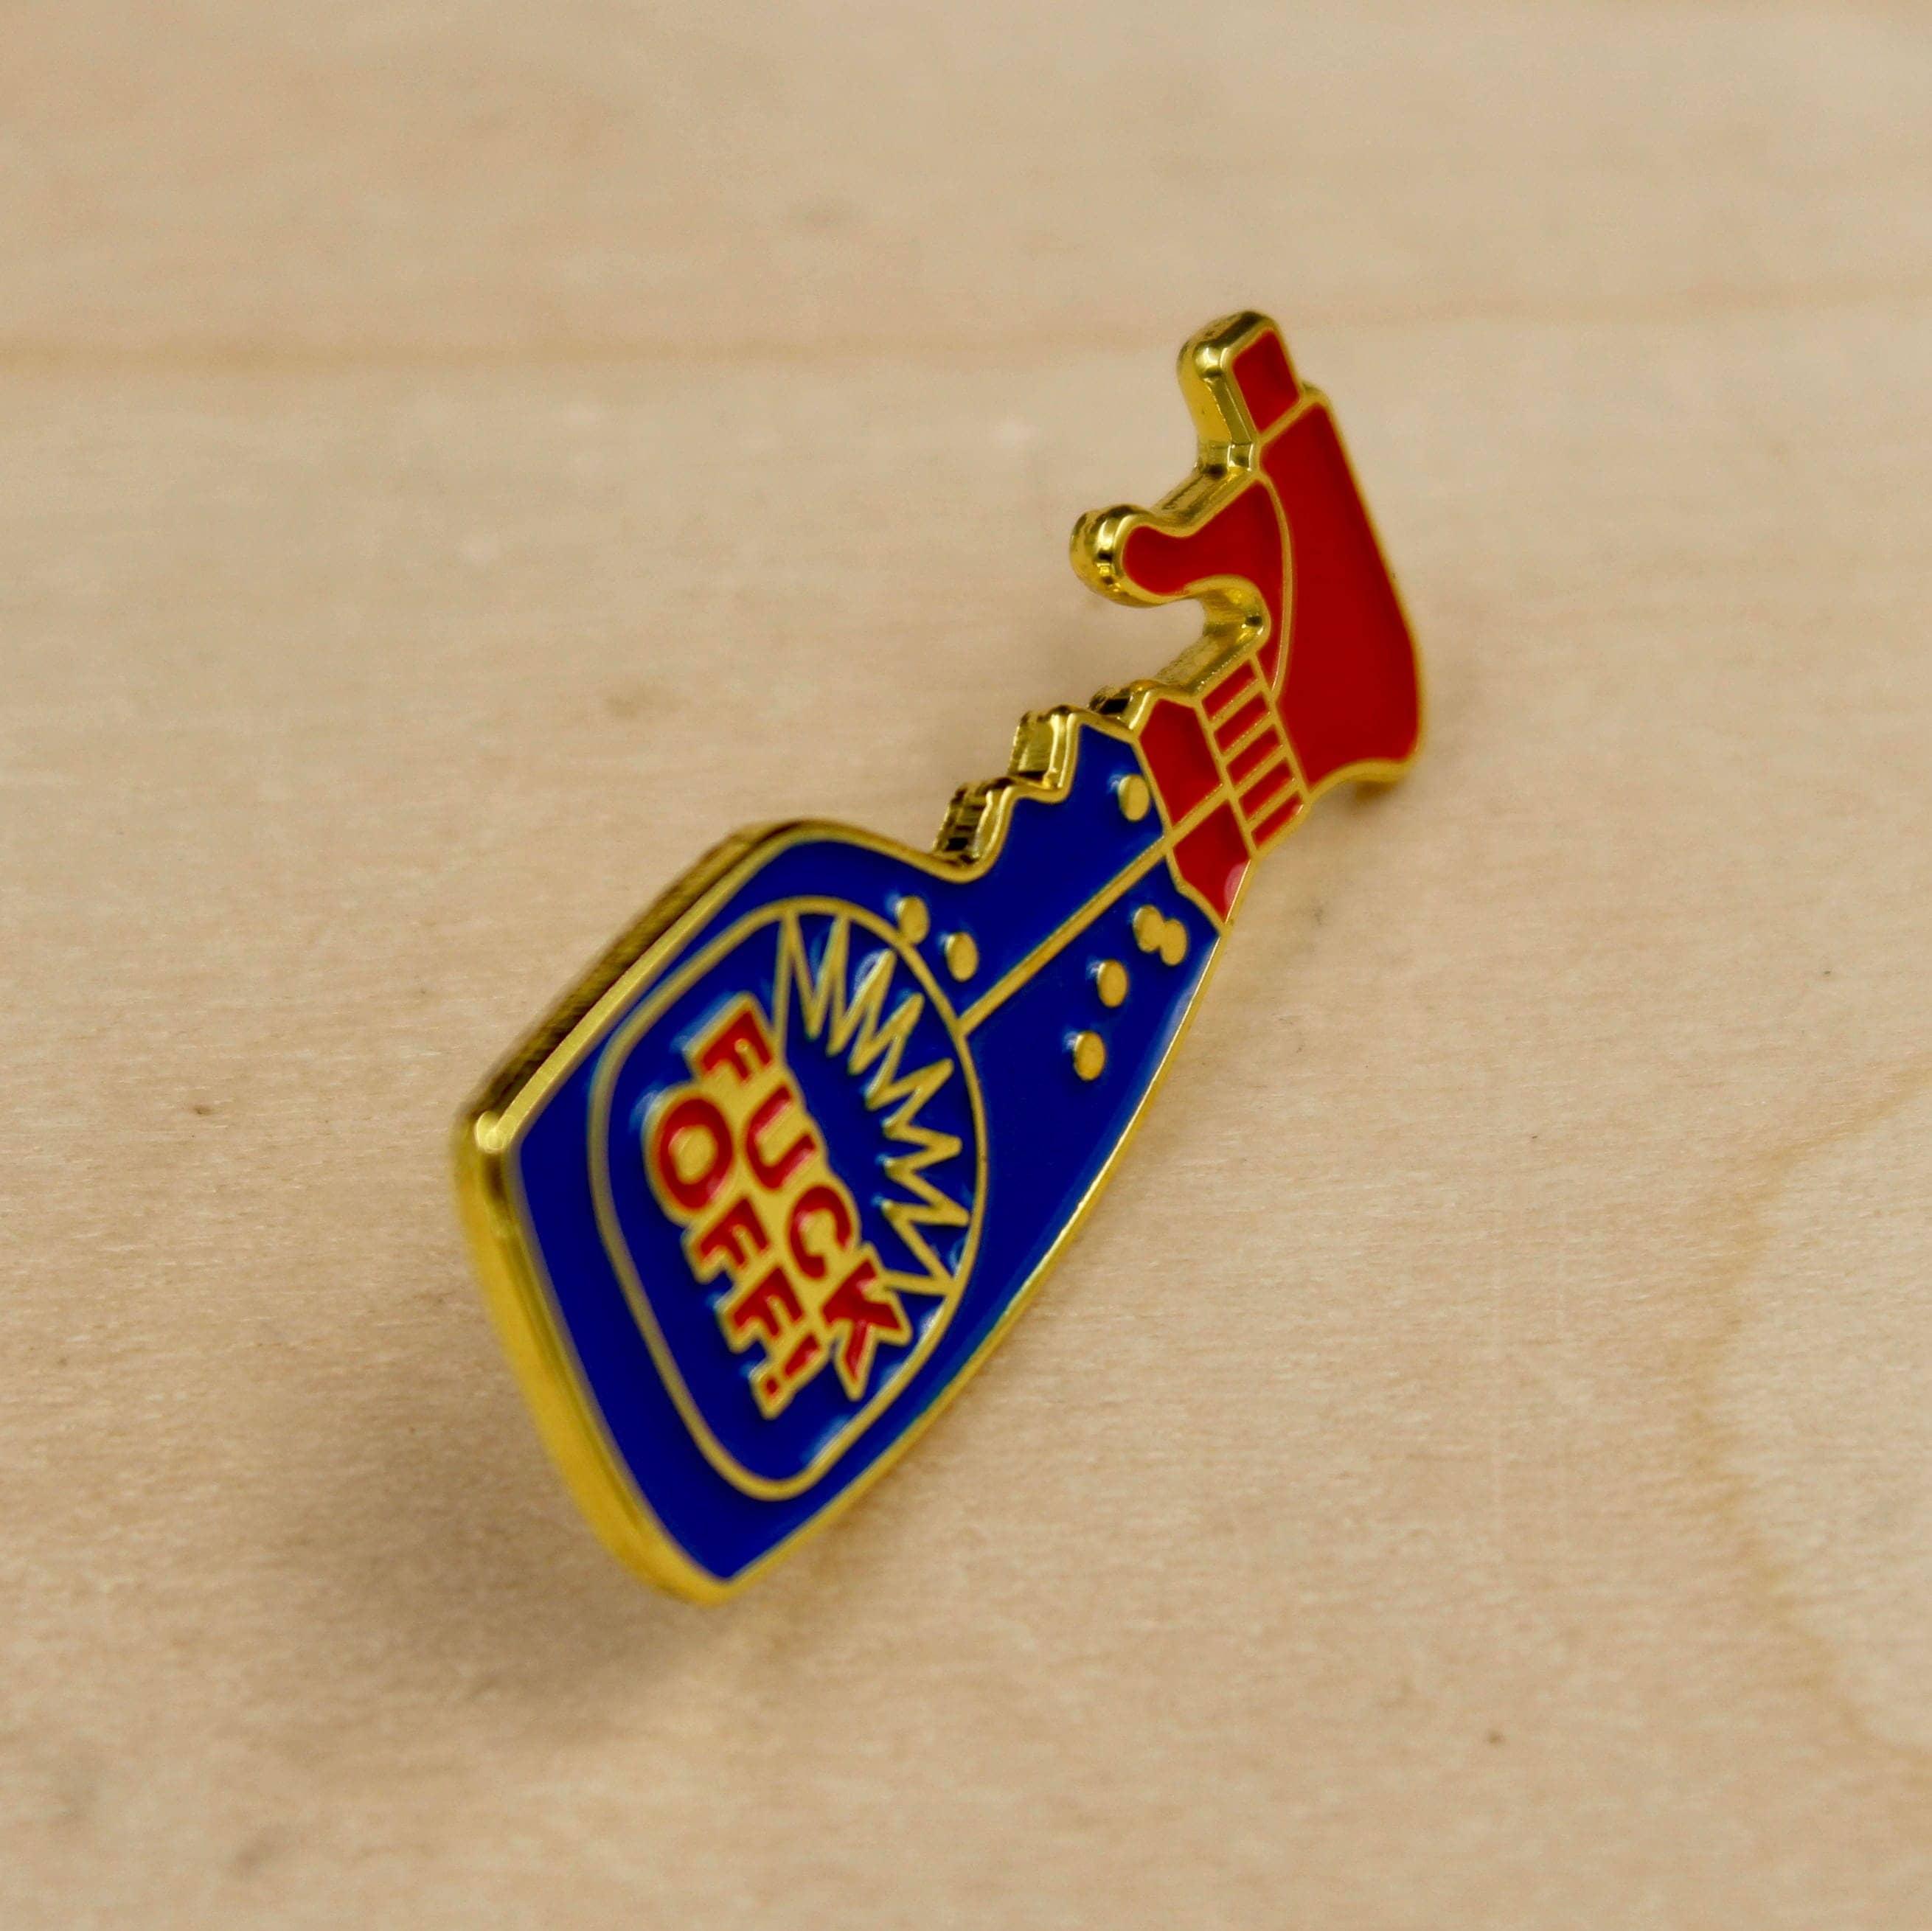 FUCK OFF PIN: Enamel Pin, Handmade, Fuck-You, Lapel Pin, Funny Pins